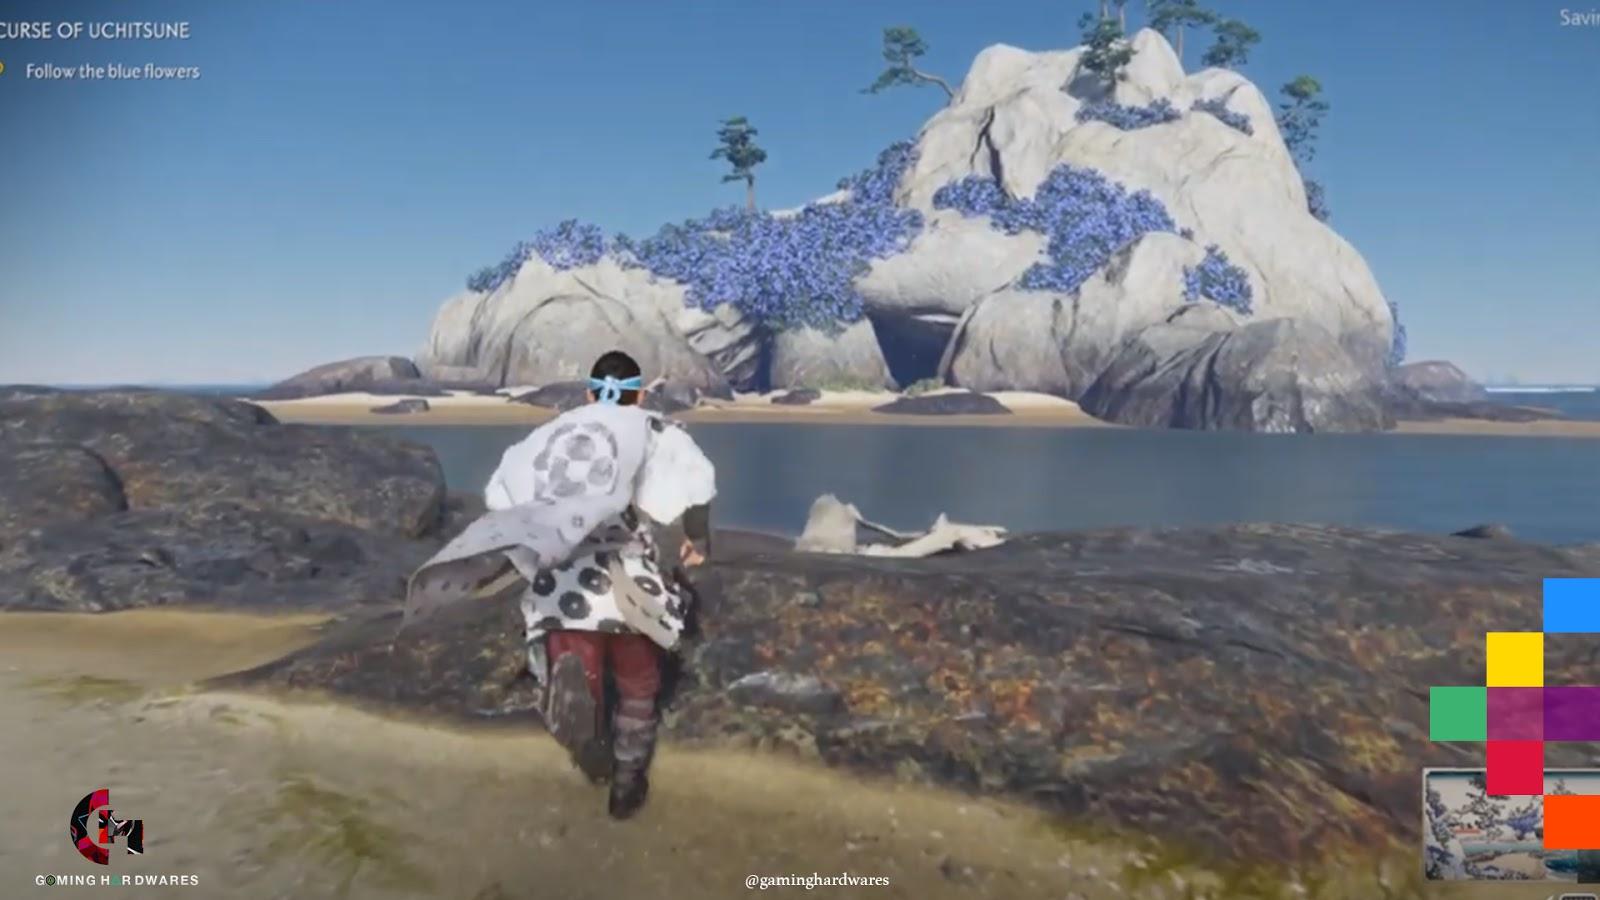 Ghost of Tsushima Curse of Uchitsune search for Hiyoshi mountain